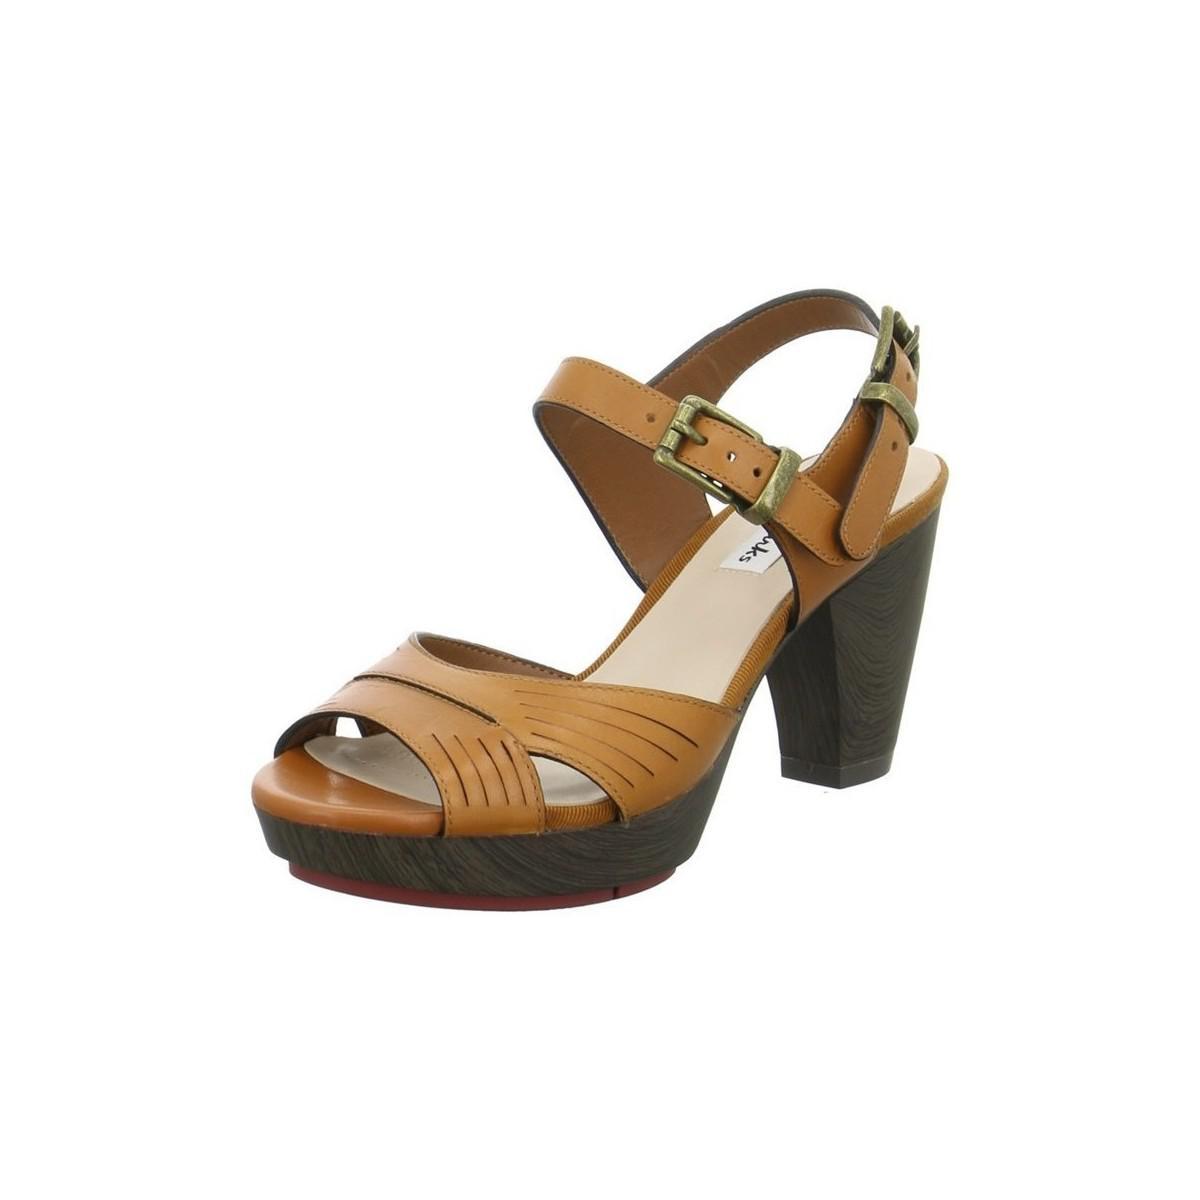 6d659b2ee Clarks Pawpaw Glass Women s Sandals In Brown in Brown - Lyst